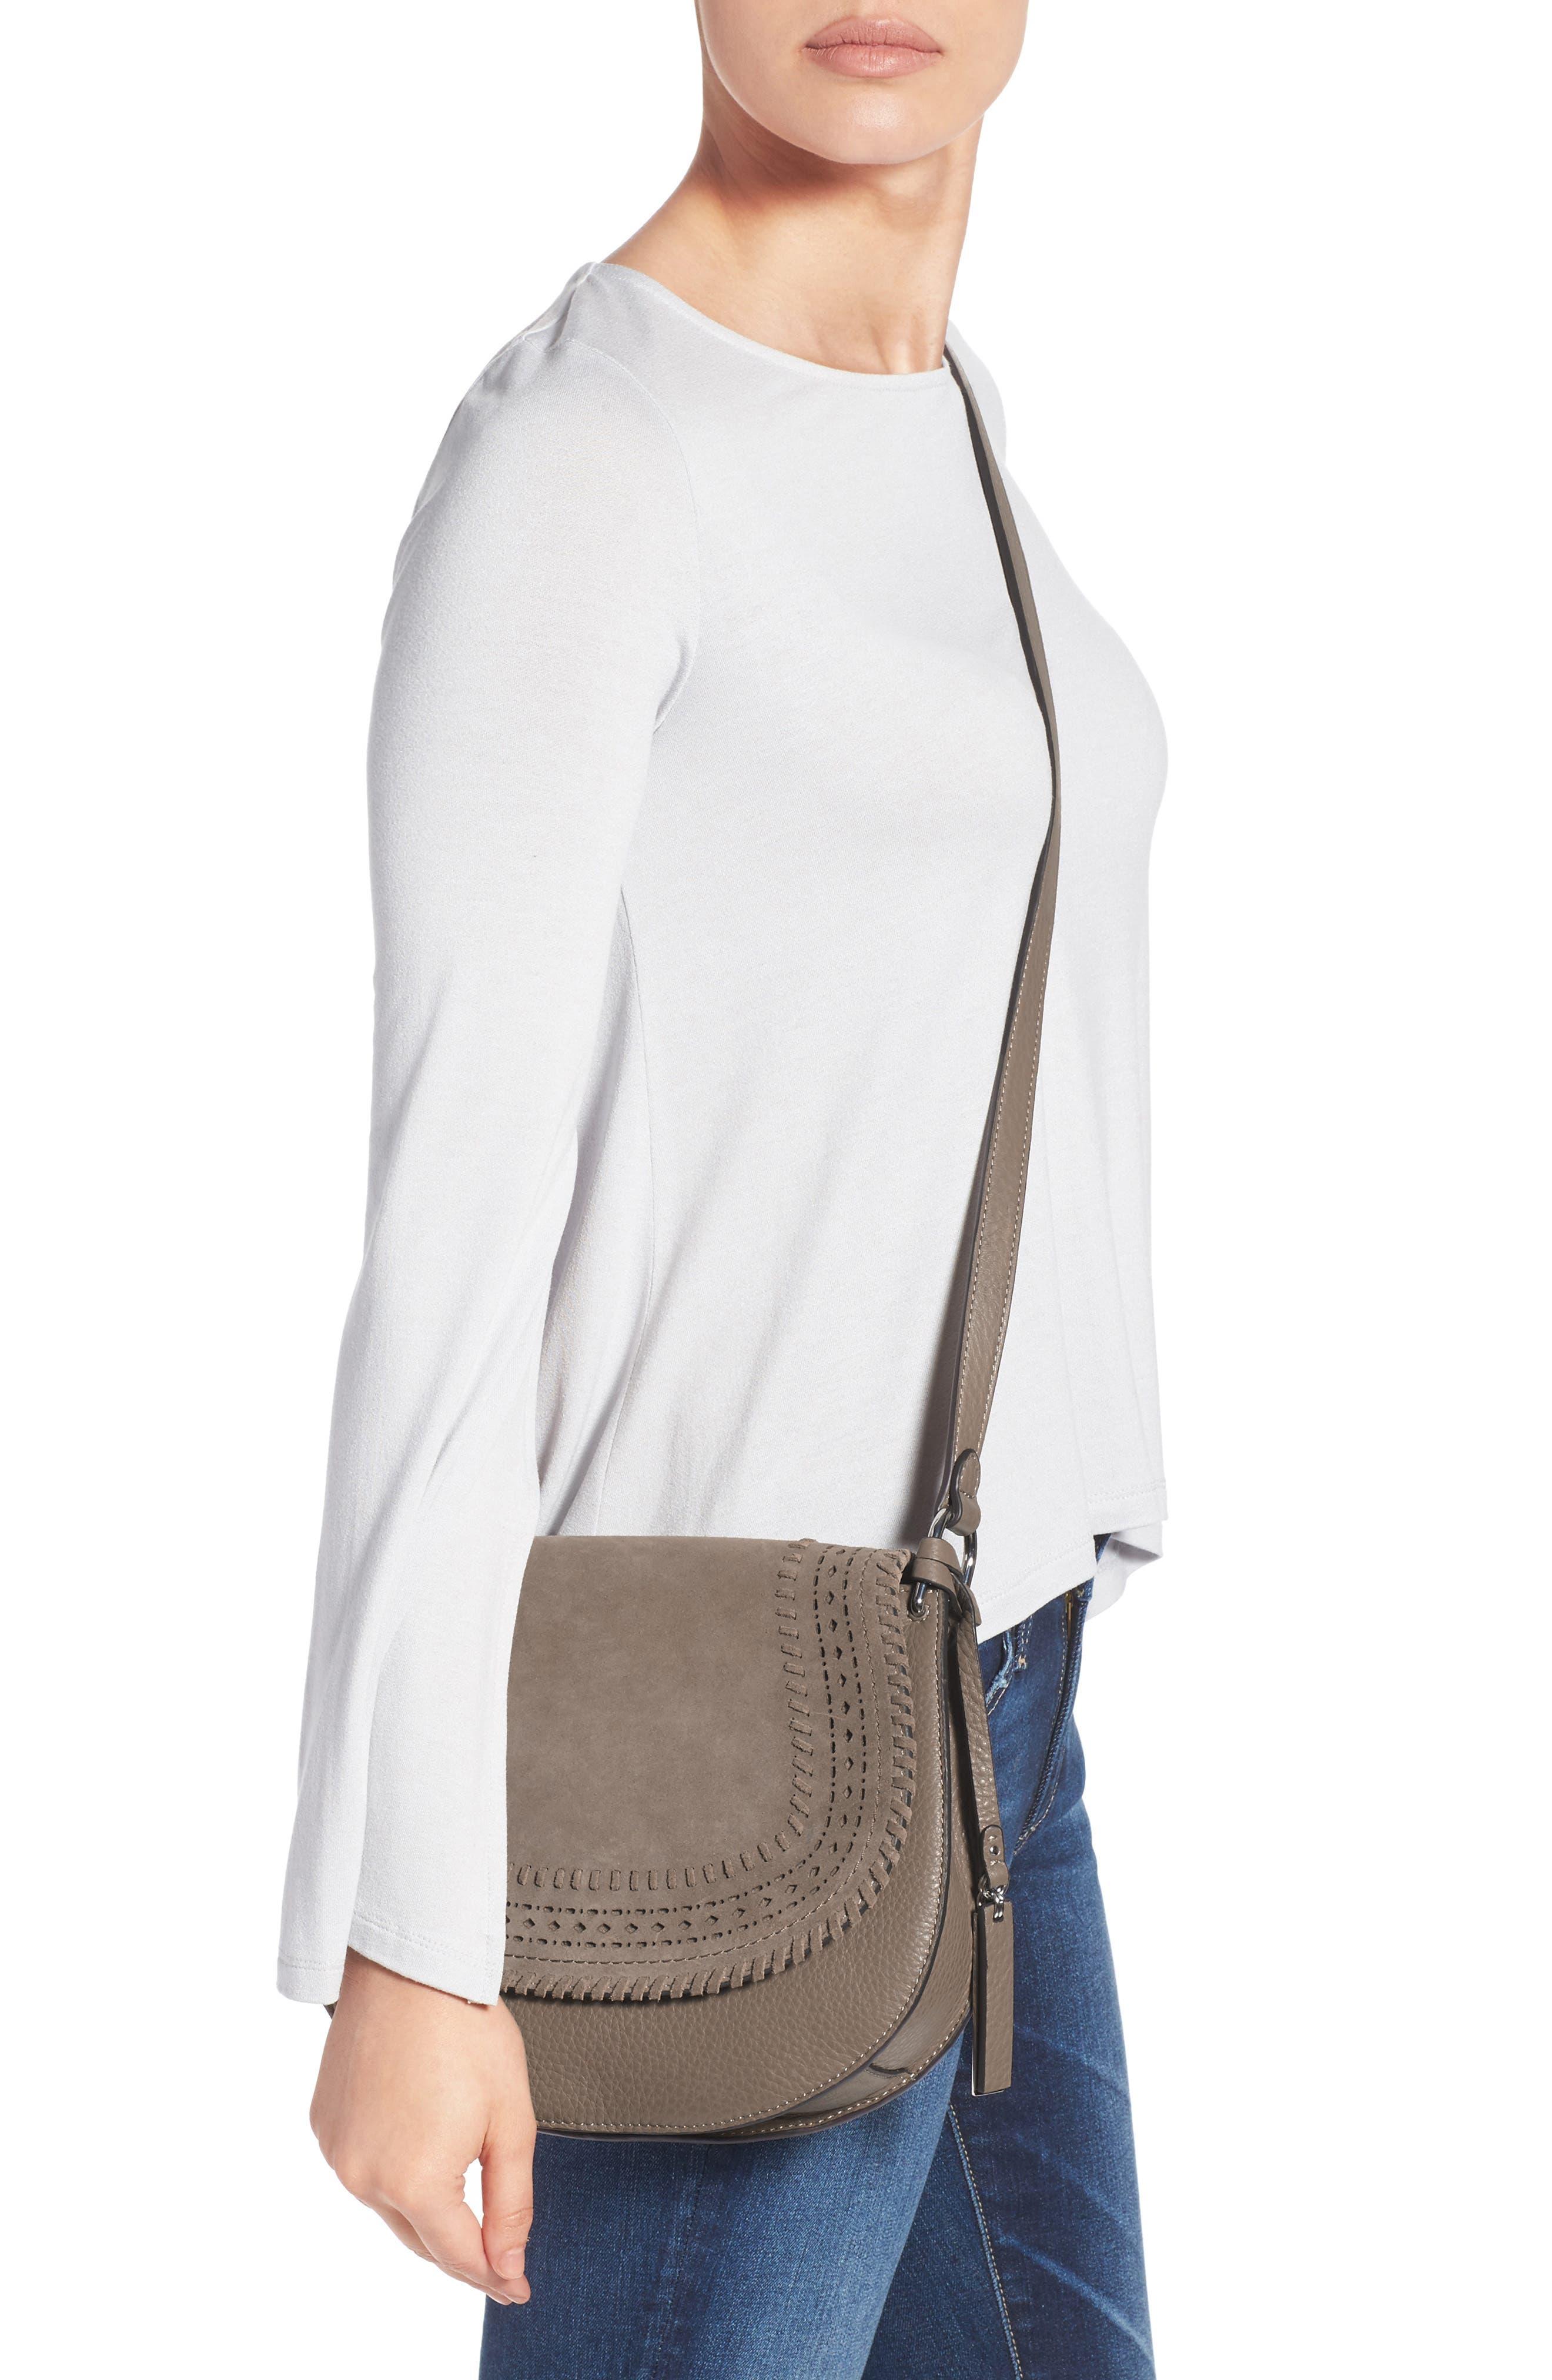 Kirie Suede & Leather Crossbody Saddle Bag,                             Alternate thumbnail 2, color,                             020